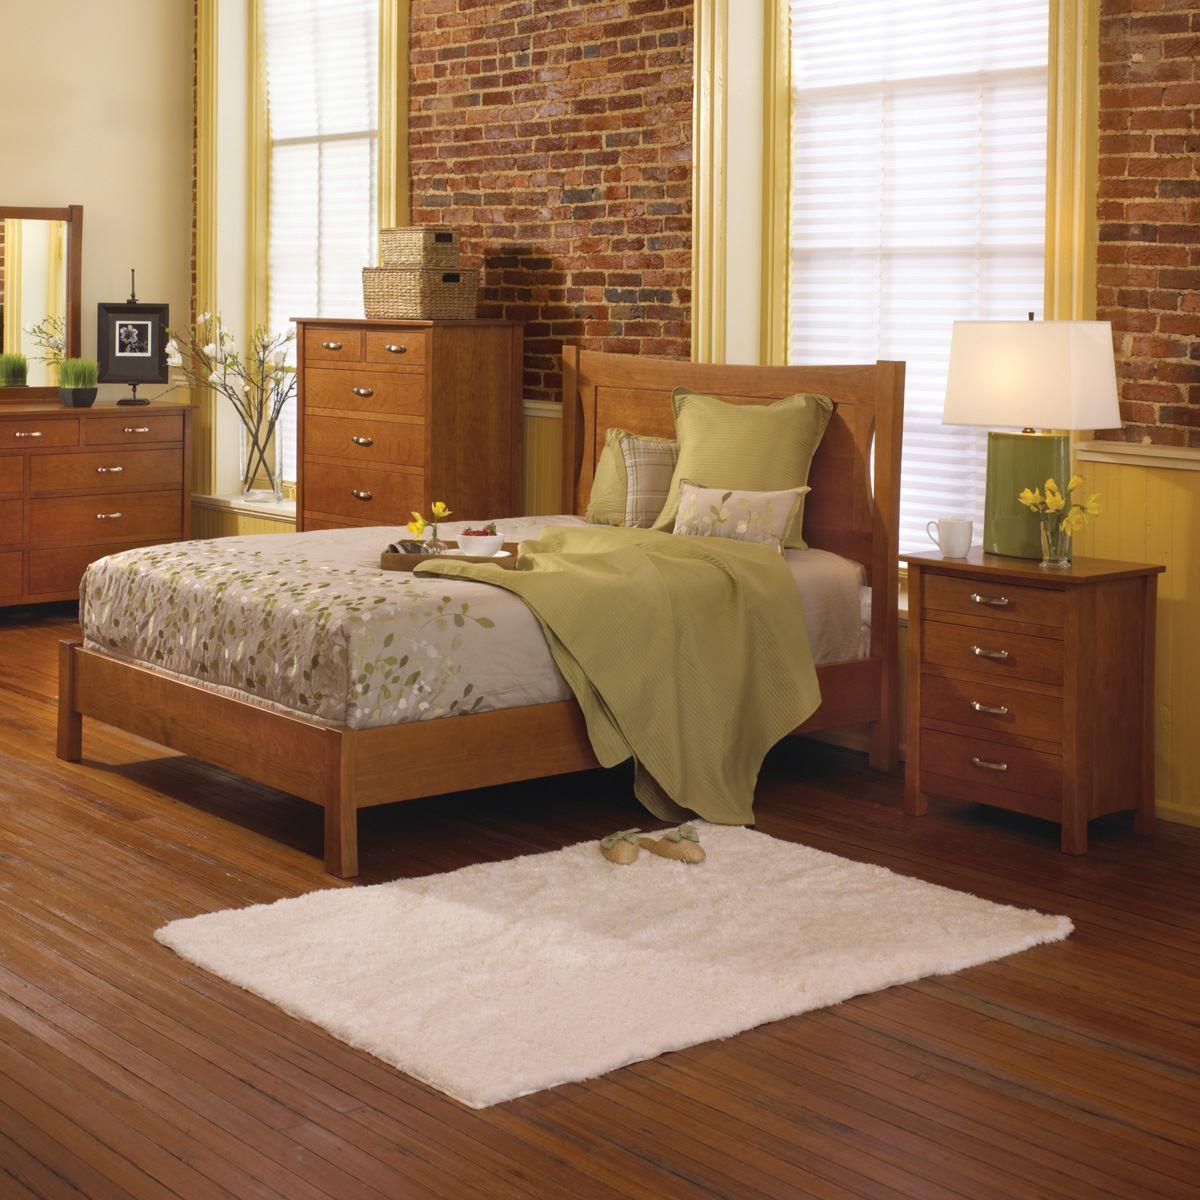 Dining Room Furniture Nj: American-made Custom Furniture